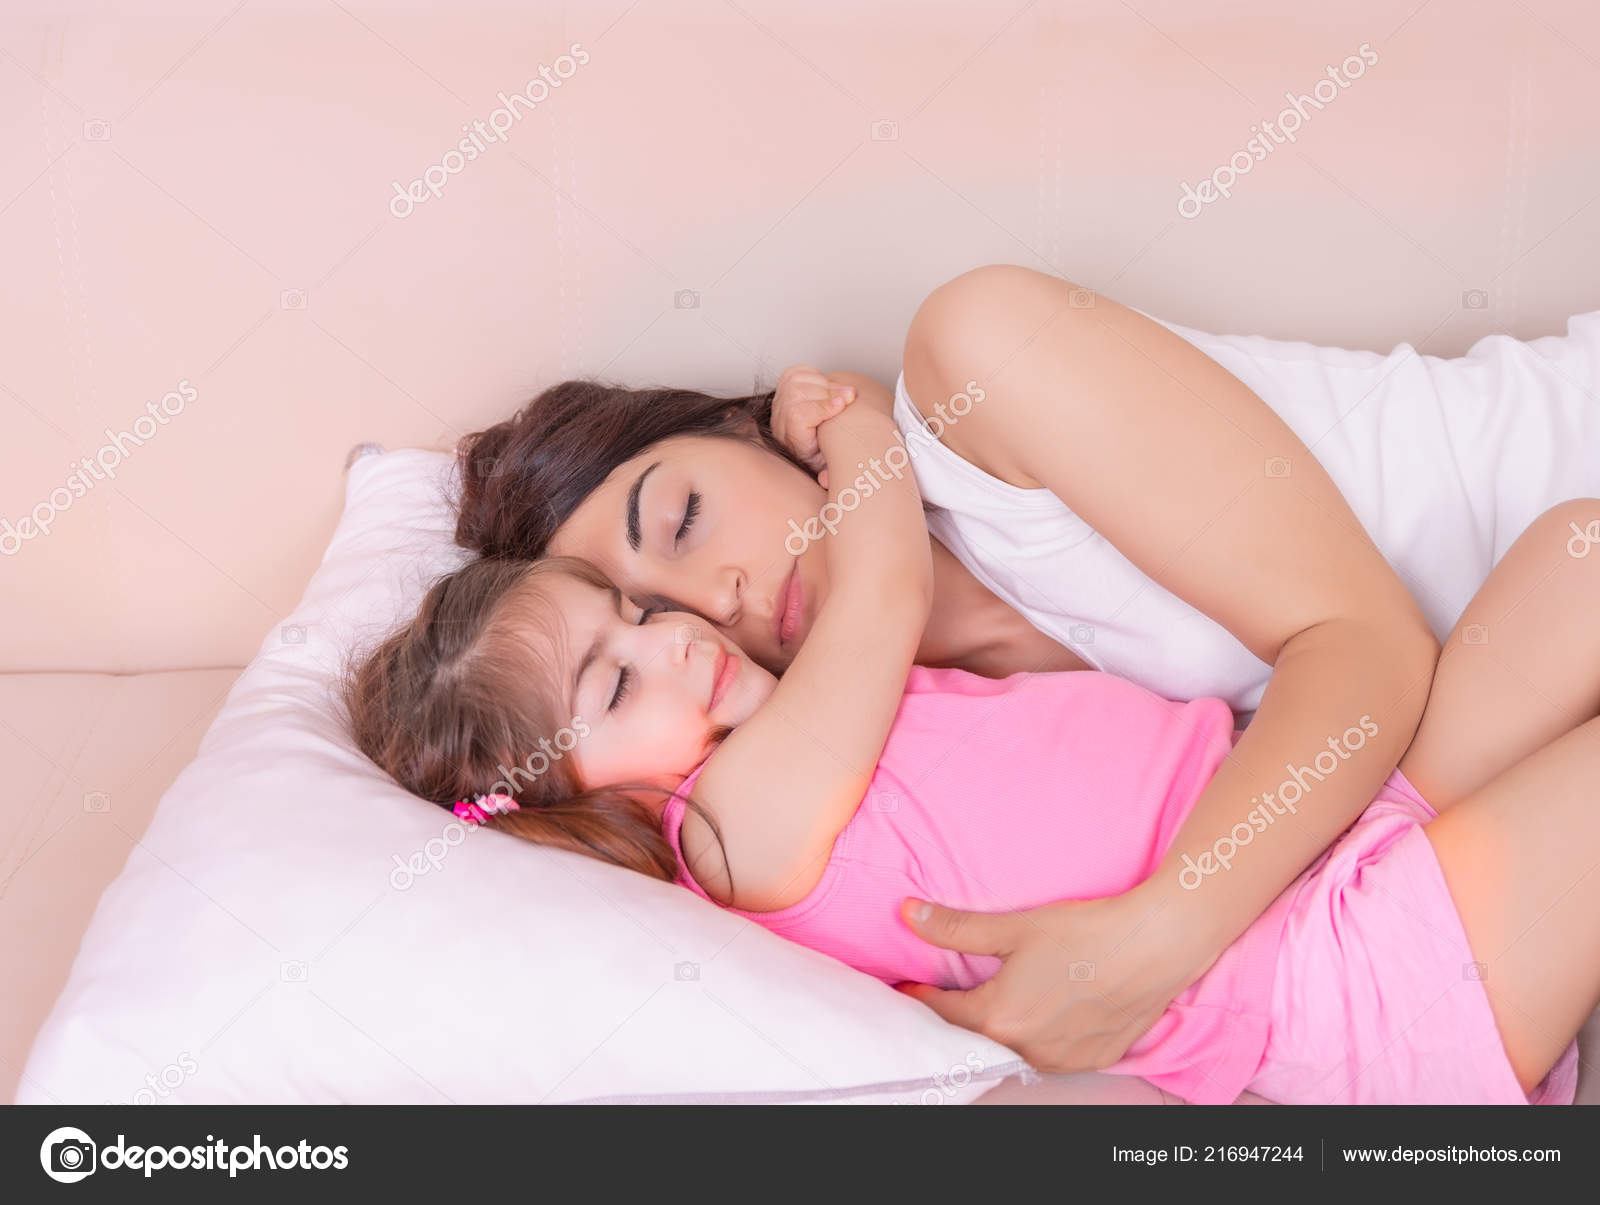 Mother daughter nude sleeping — photo 14